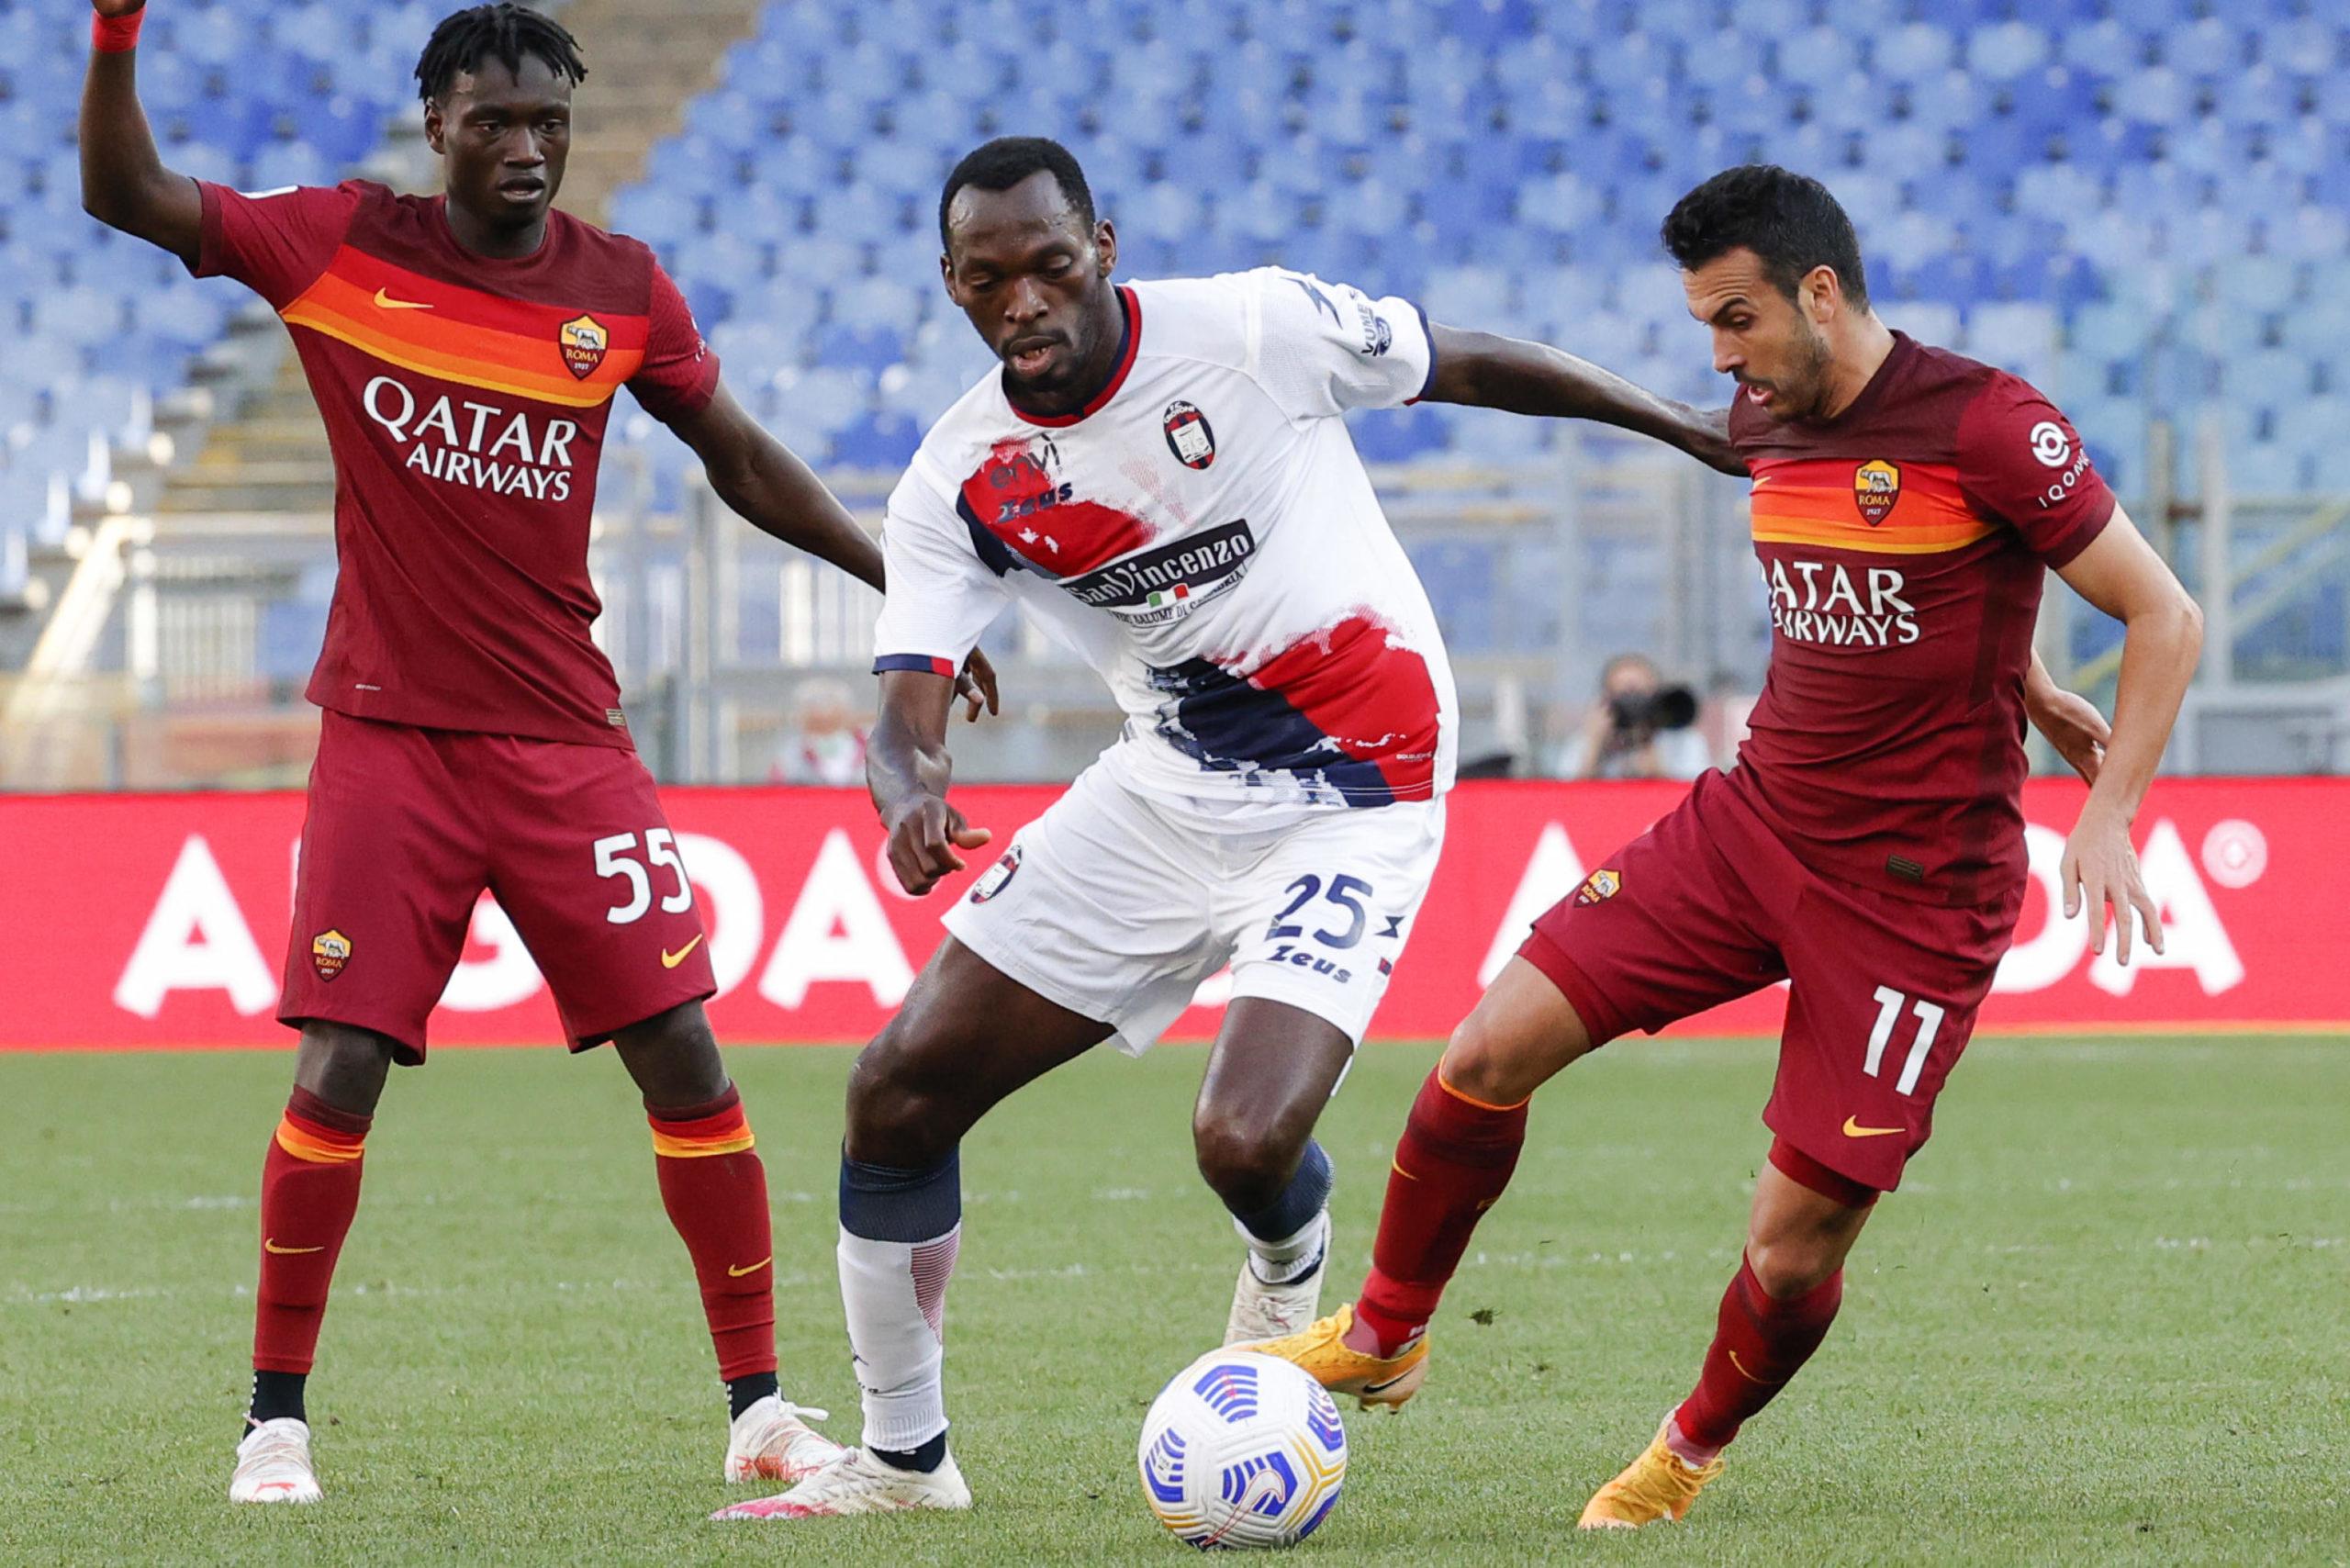 Crotone's Simy pressured by Roma pair Pedro Rodriguez and Ebrima Darboe